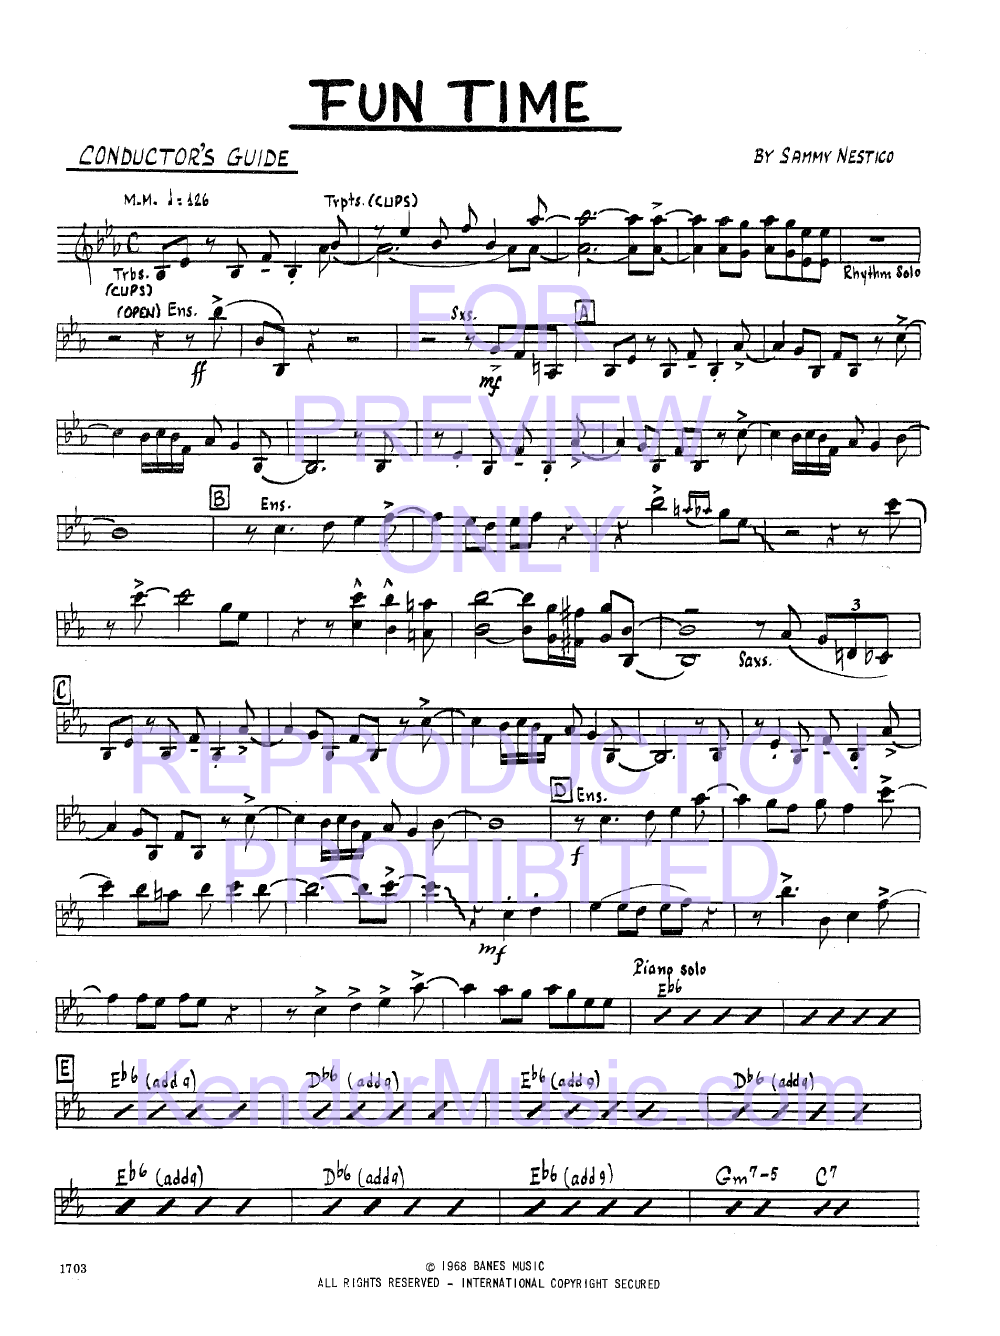 Fun Time by Sammy Nestico| J.W. Pepper Sheet Music